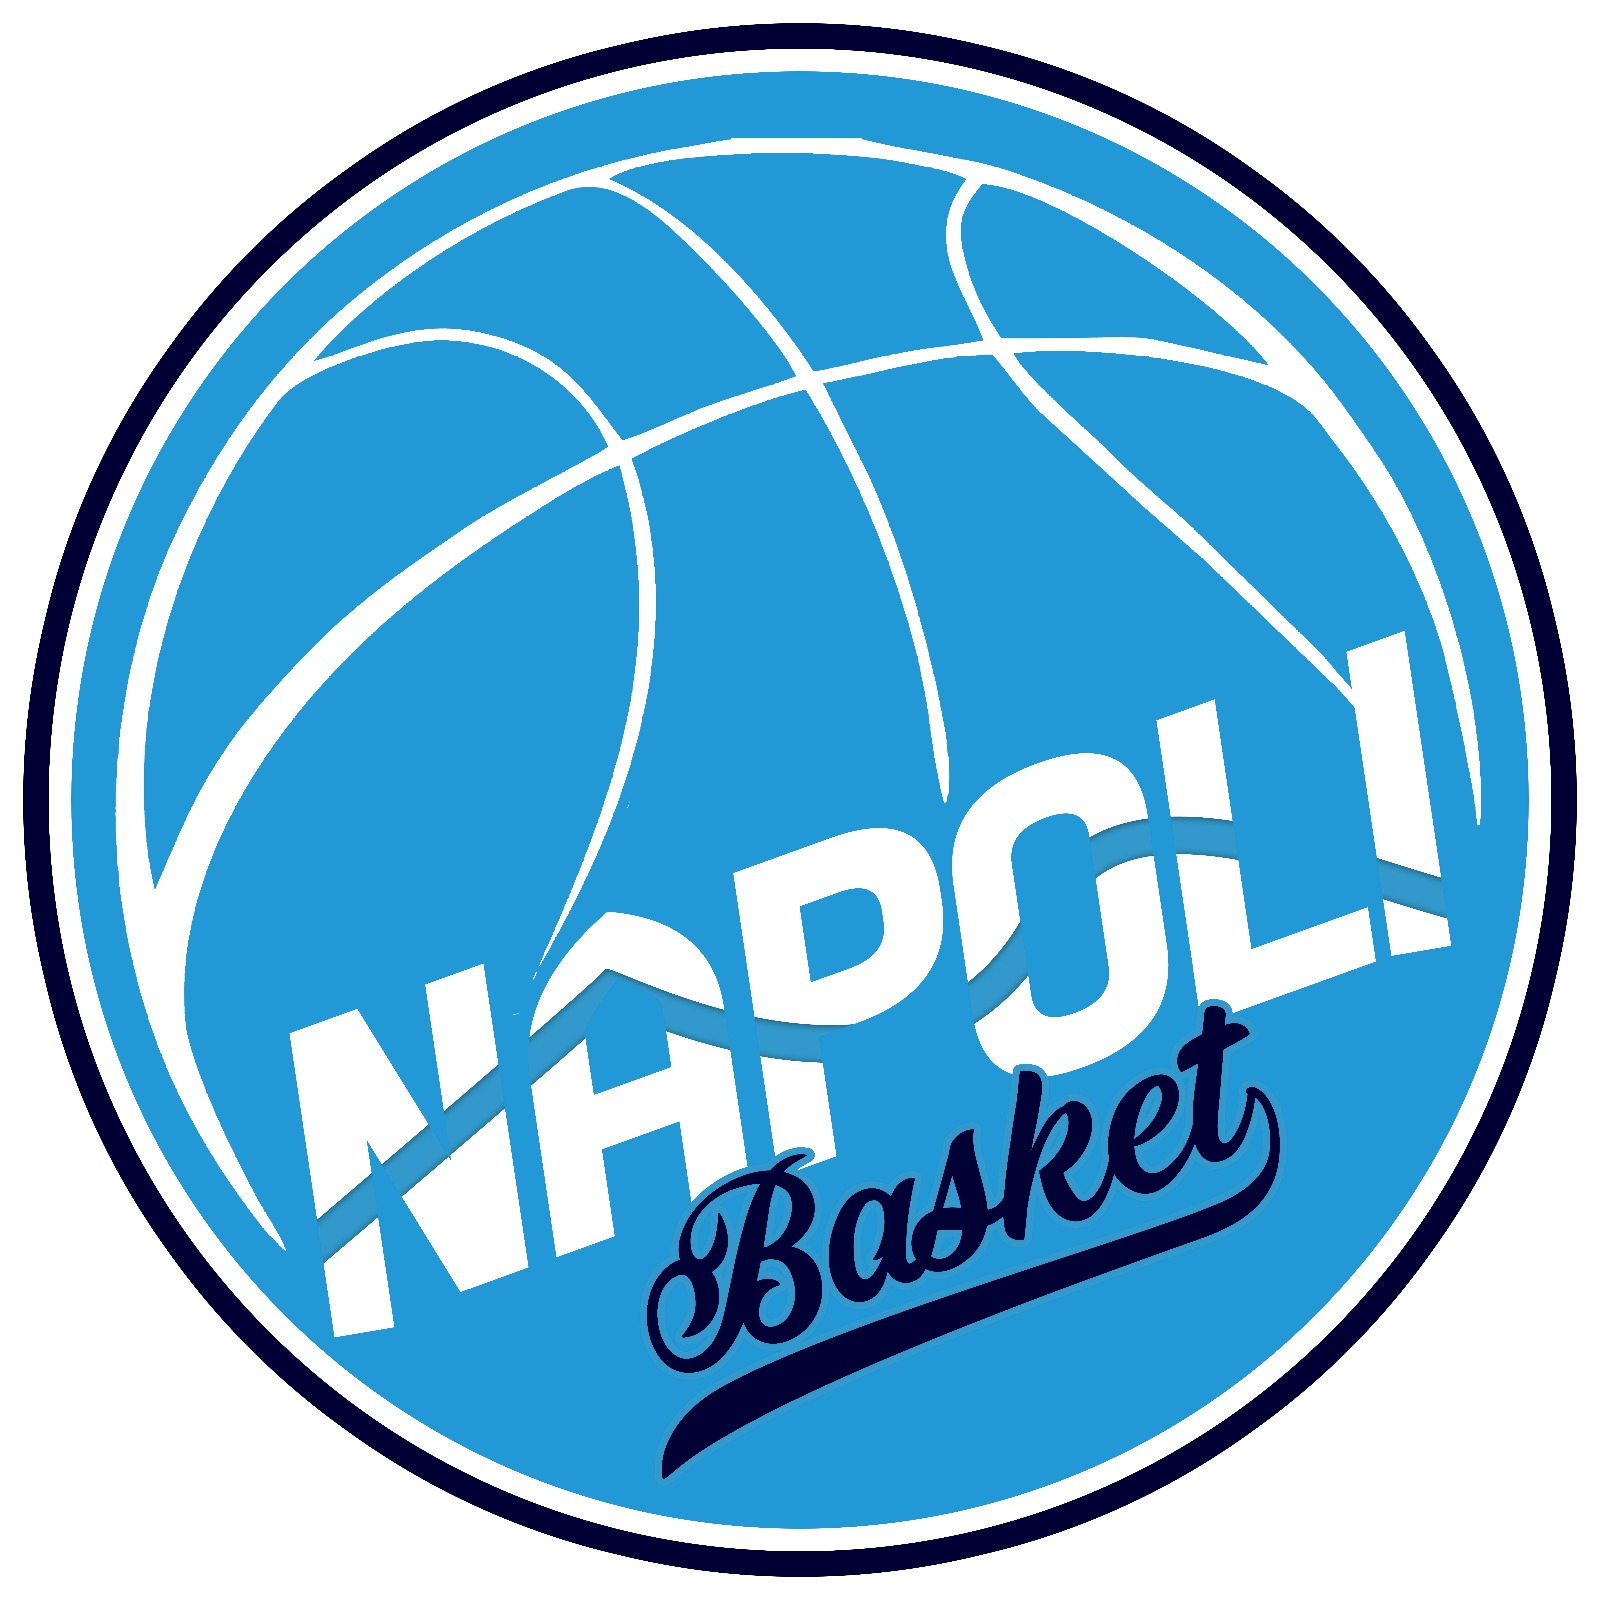 Gevi Napoli